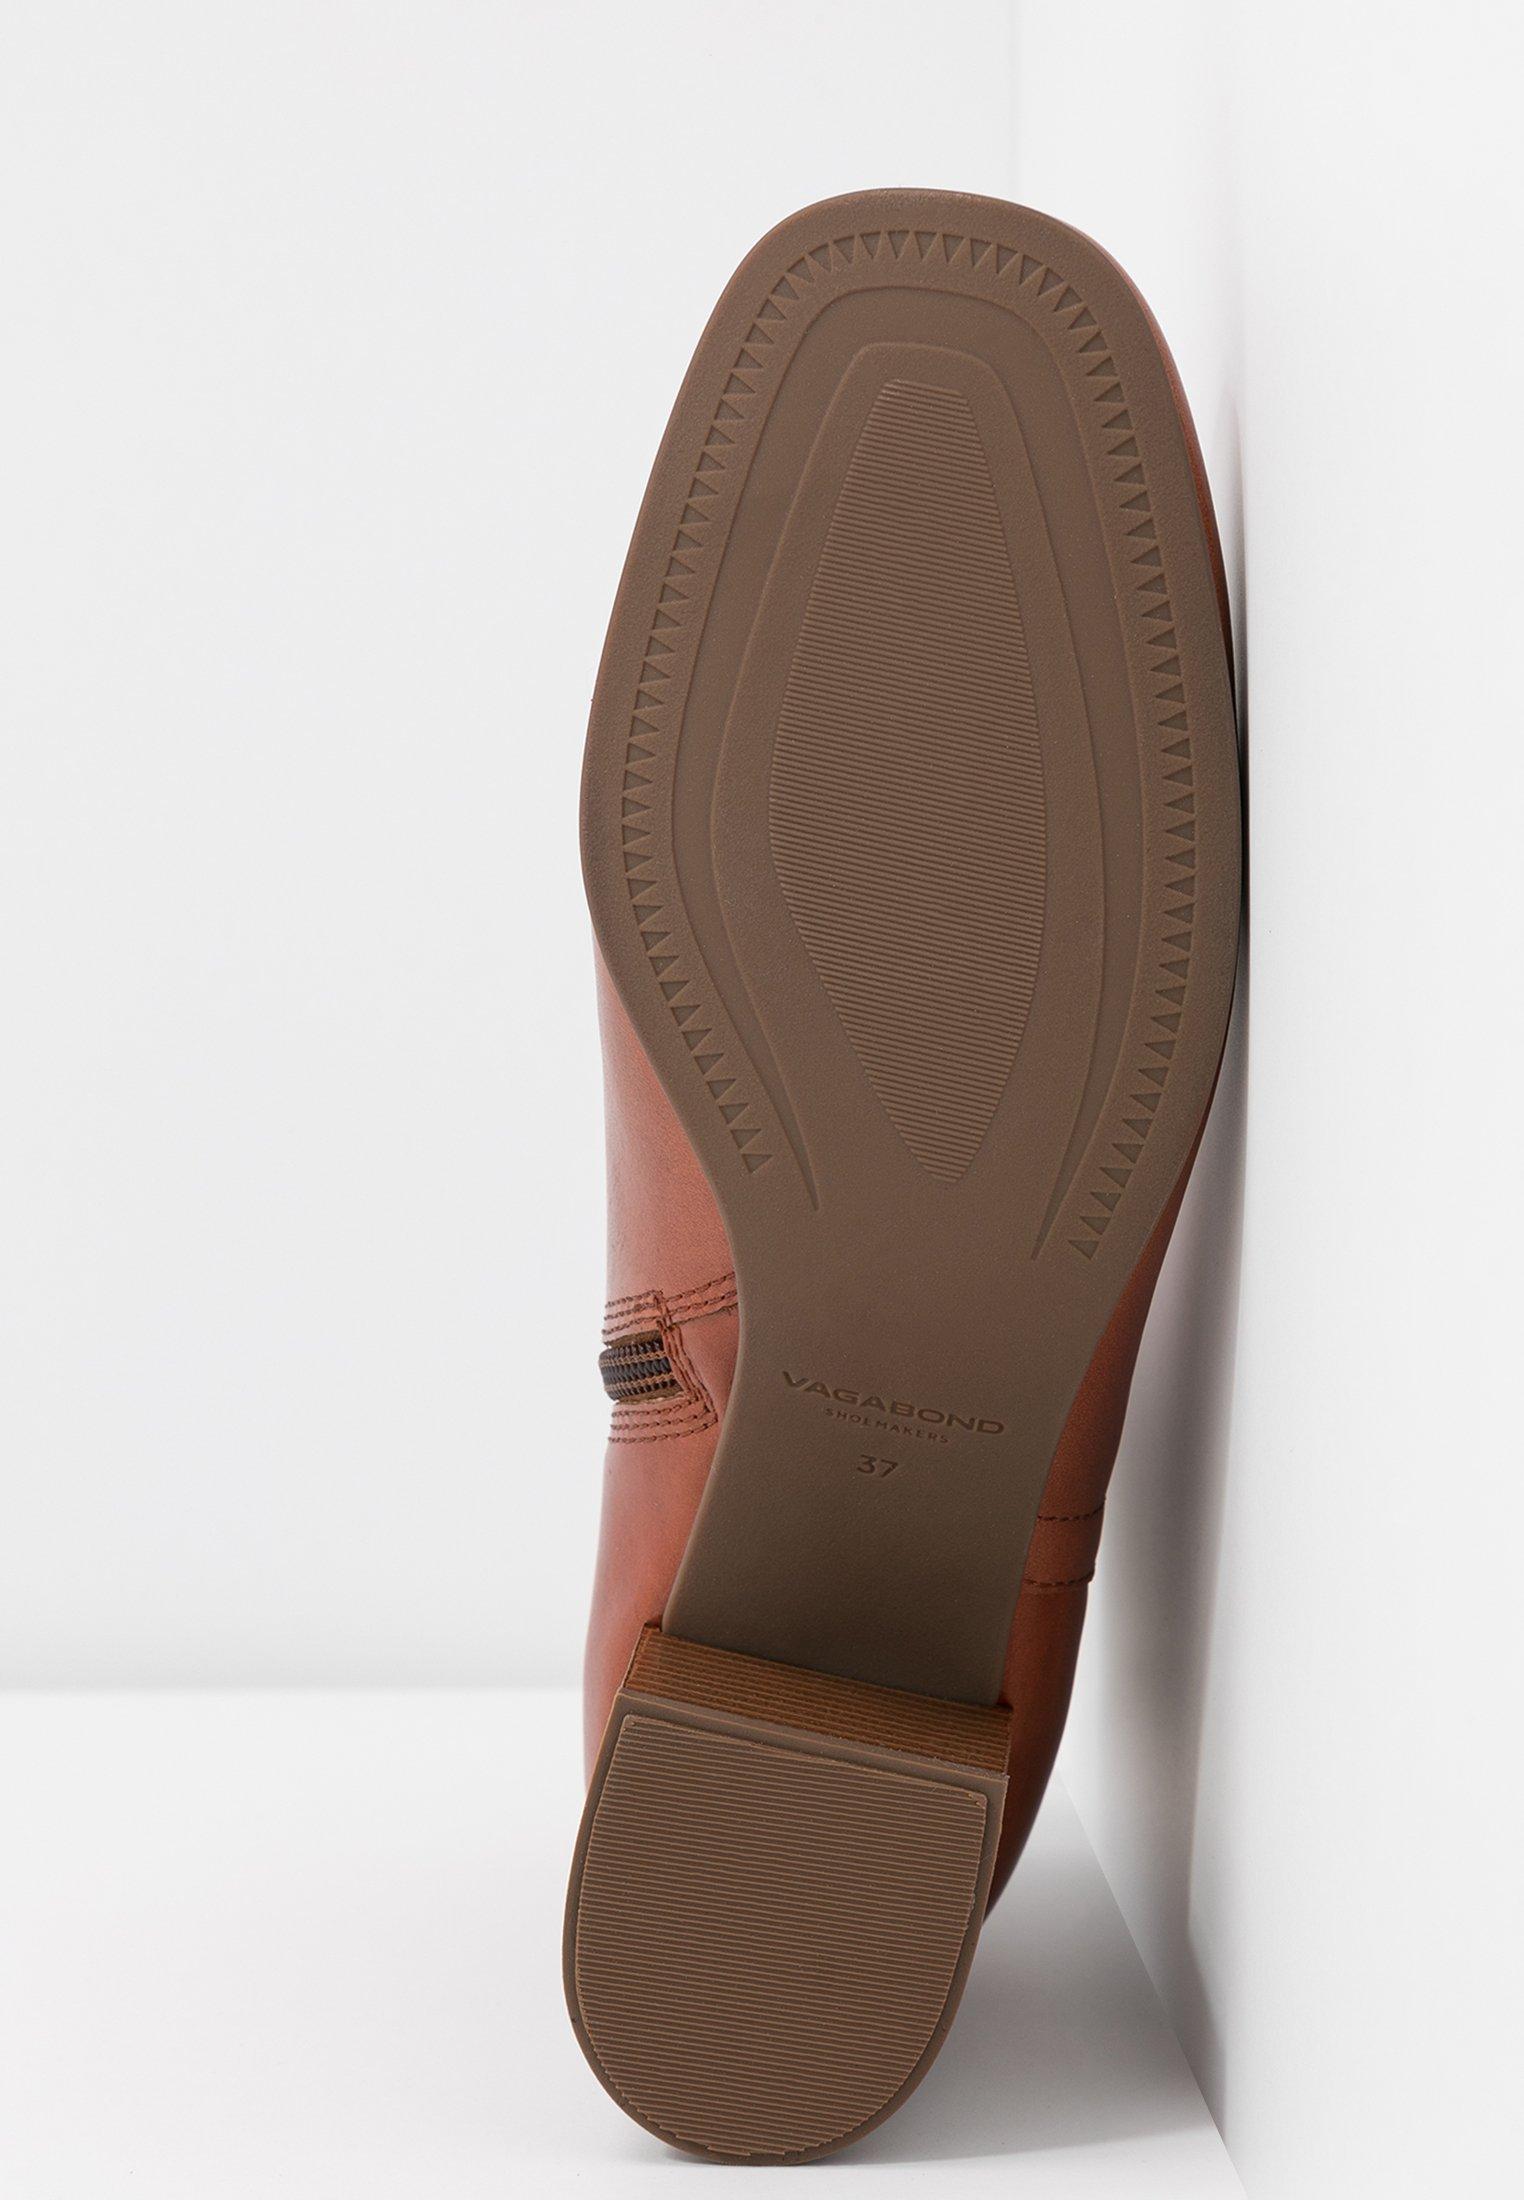 Vagabond NICOLE Støvletter cinnamonbrun Zalando.no